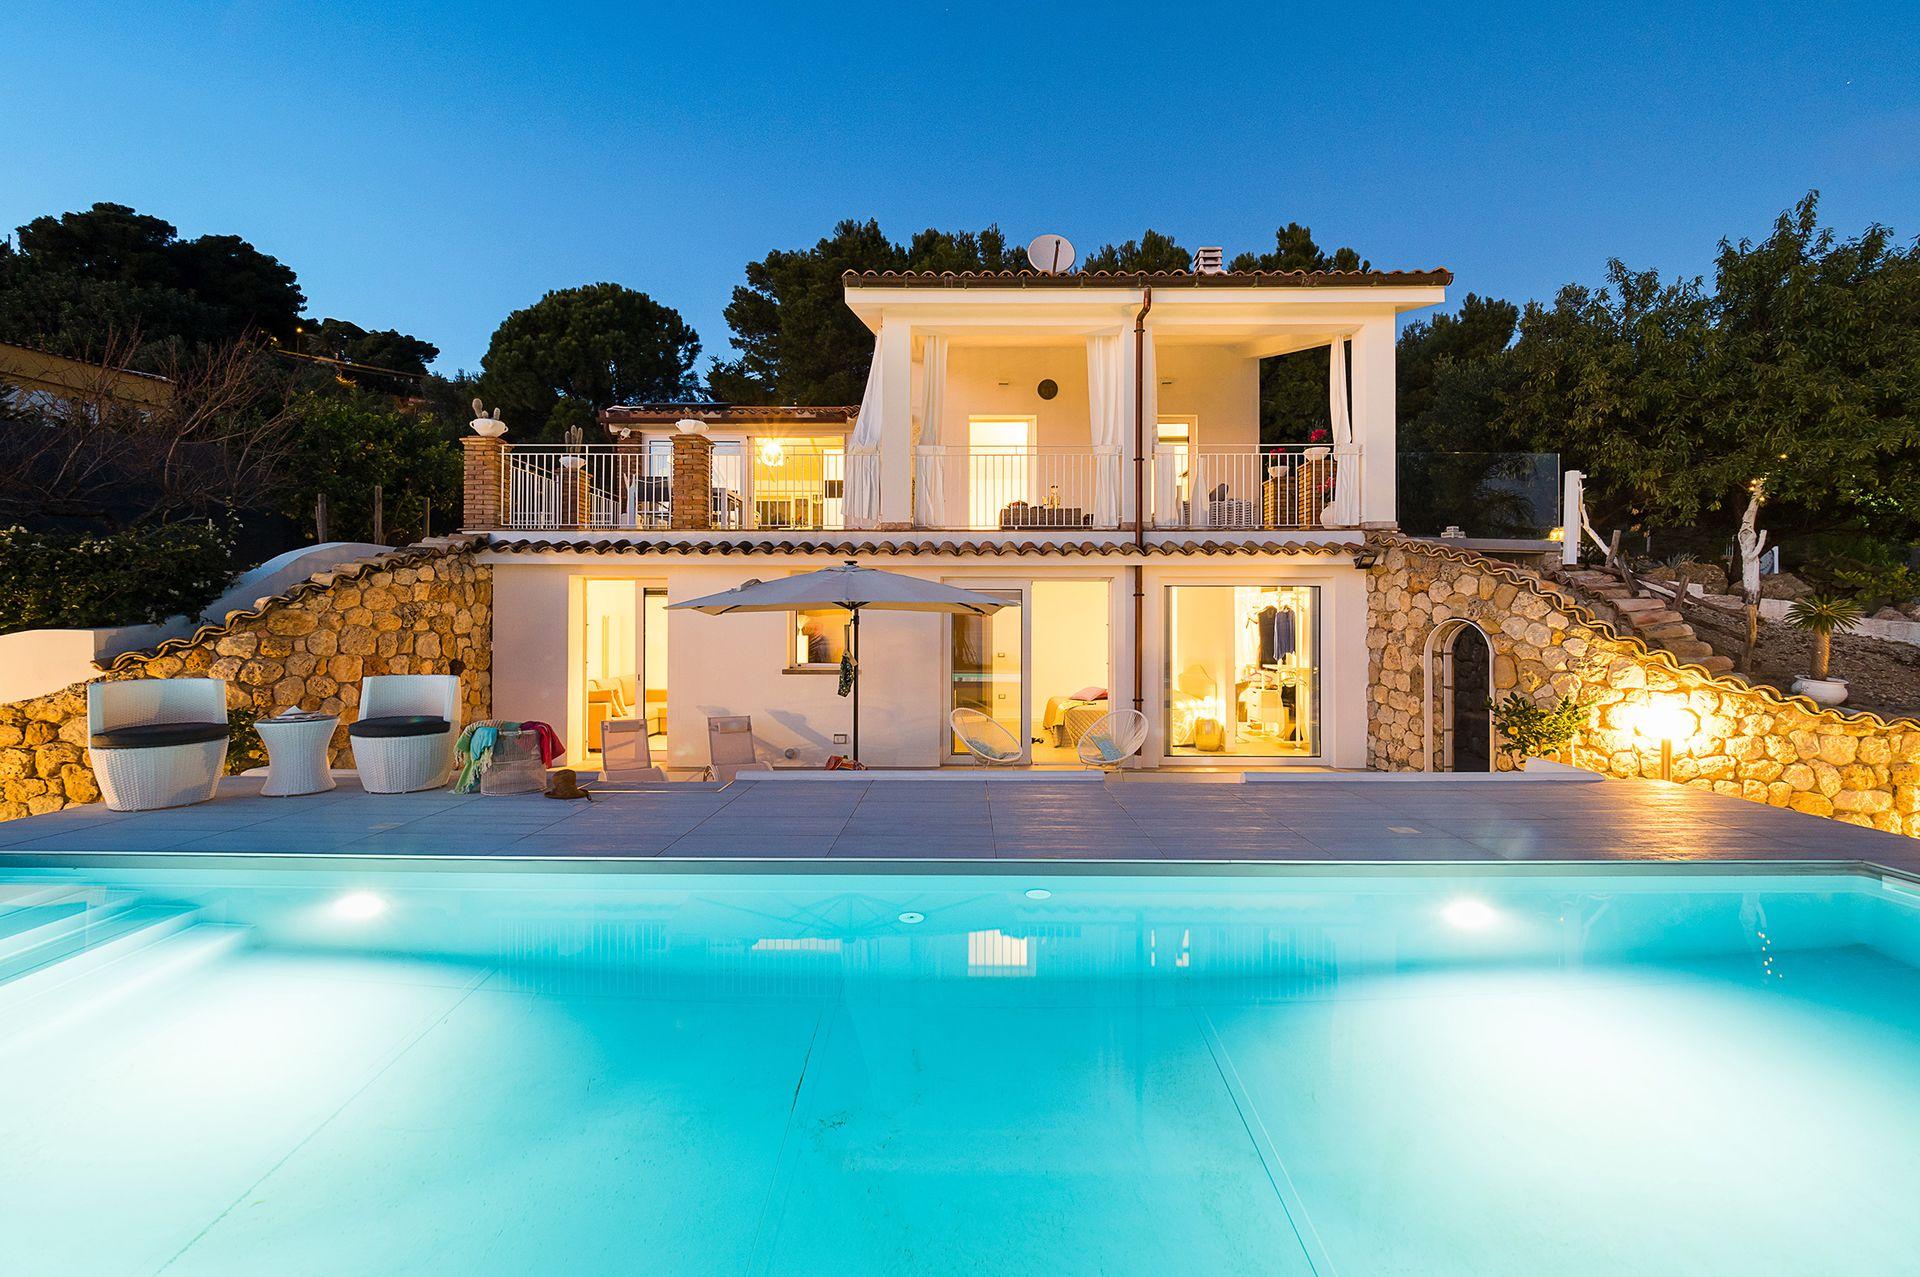 Villa Licata - Luxury rental in Sicily with Pool